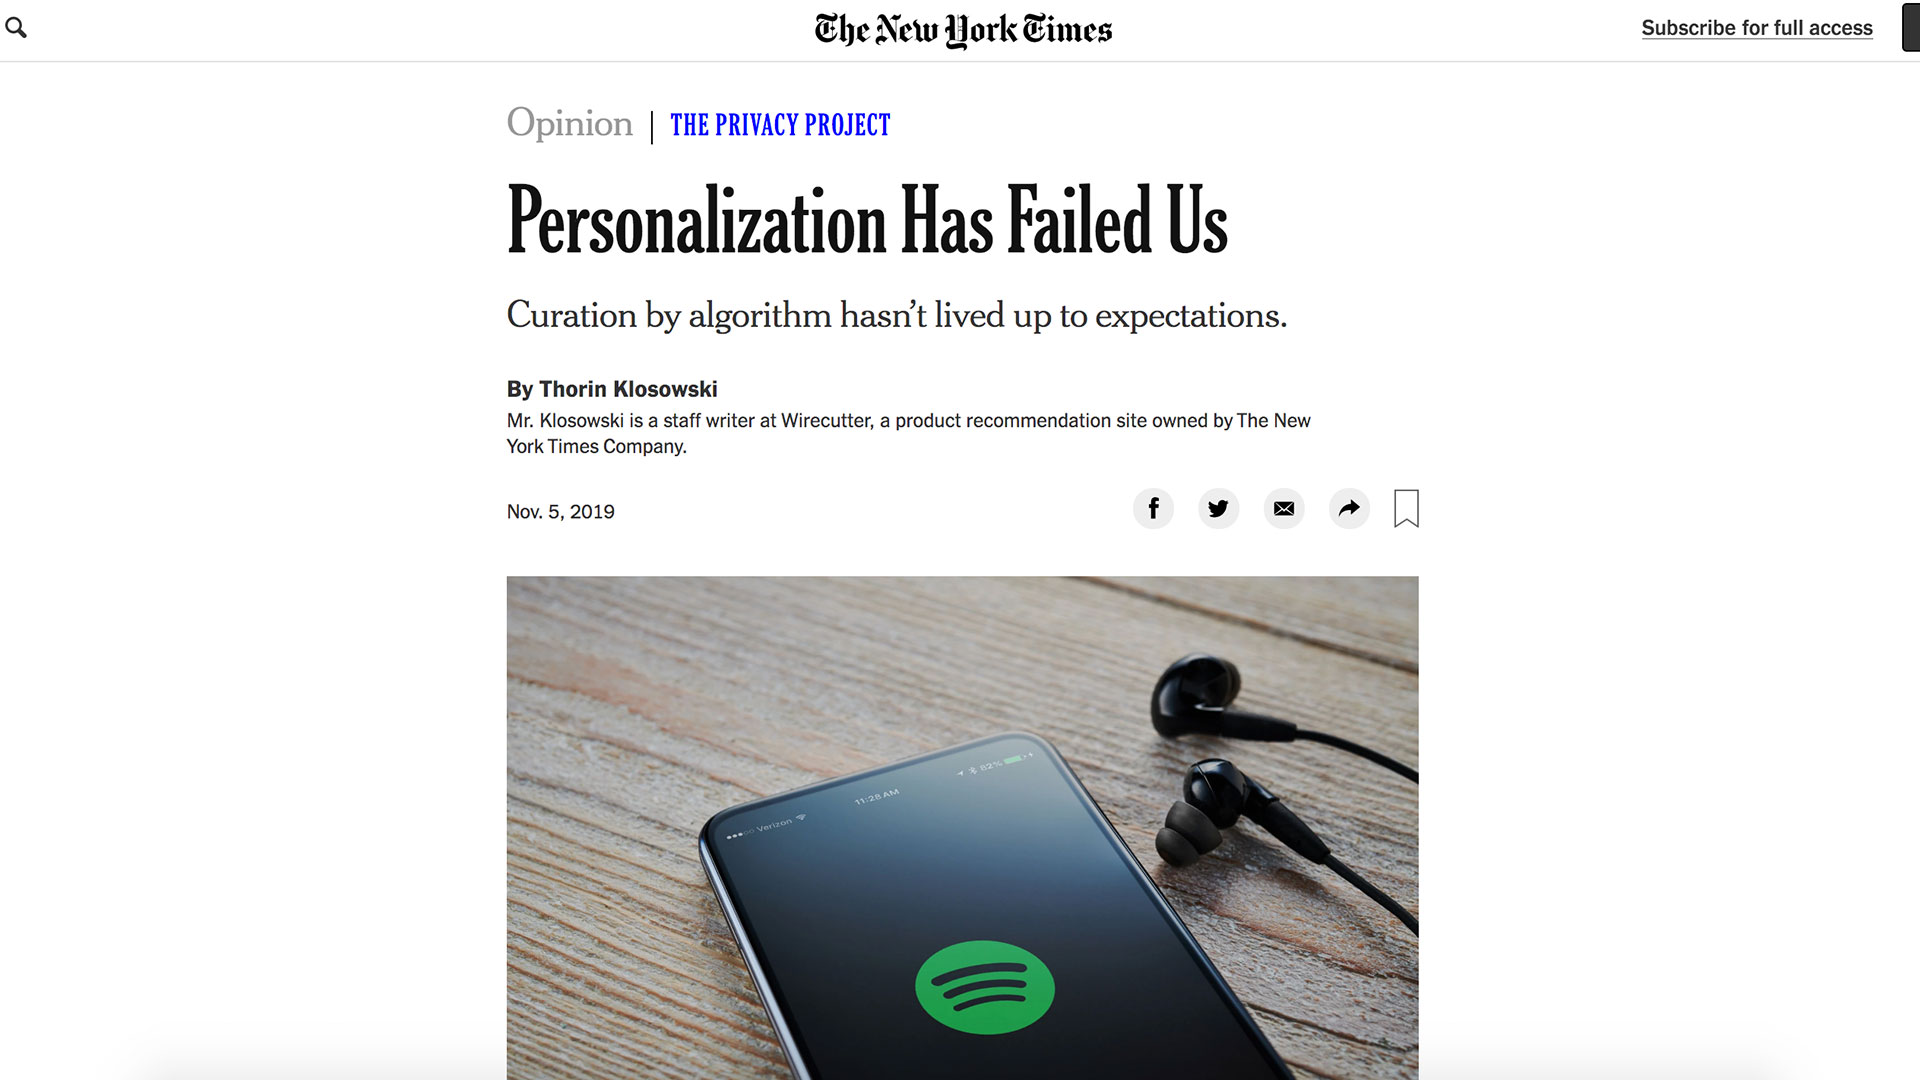 Fairness Rocks News Personalization Has Failed Us